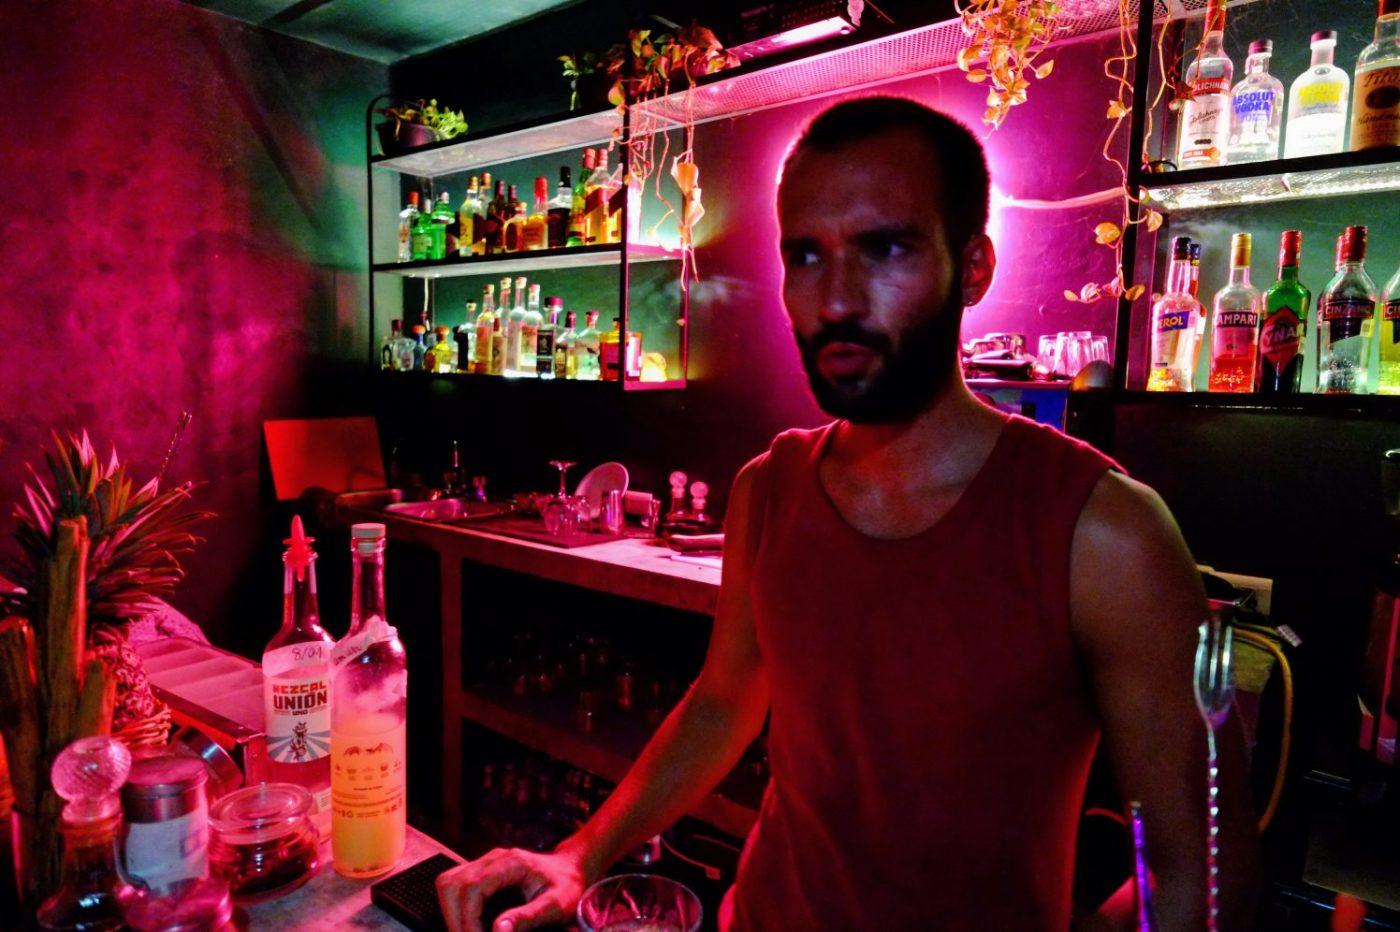 L'ambiance inimitable des bars de Tulum